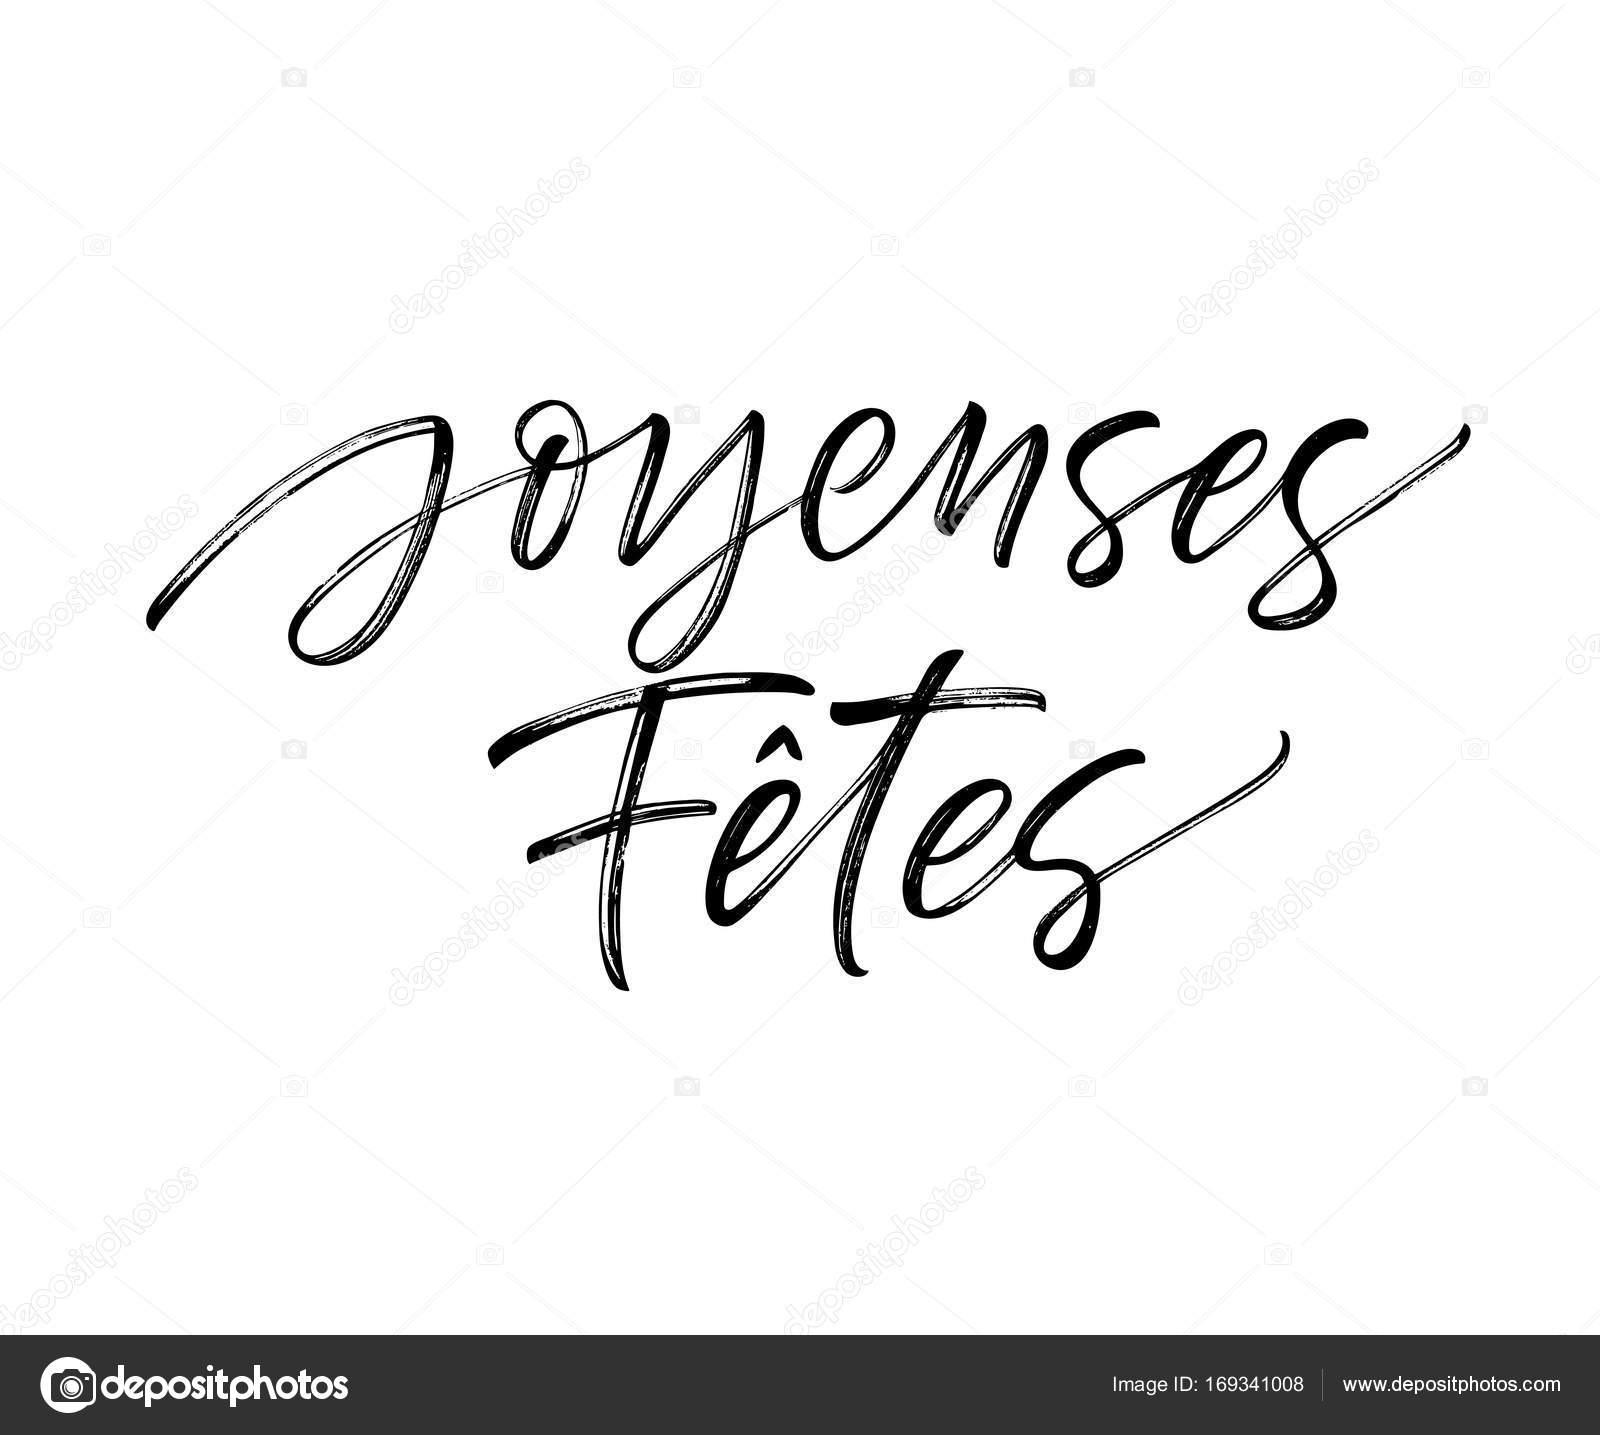 Joyeuses Ftes French Phrase Vetores De Stock Gevko93